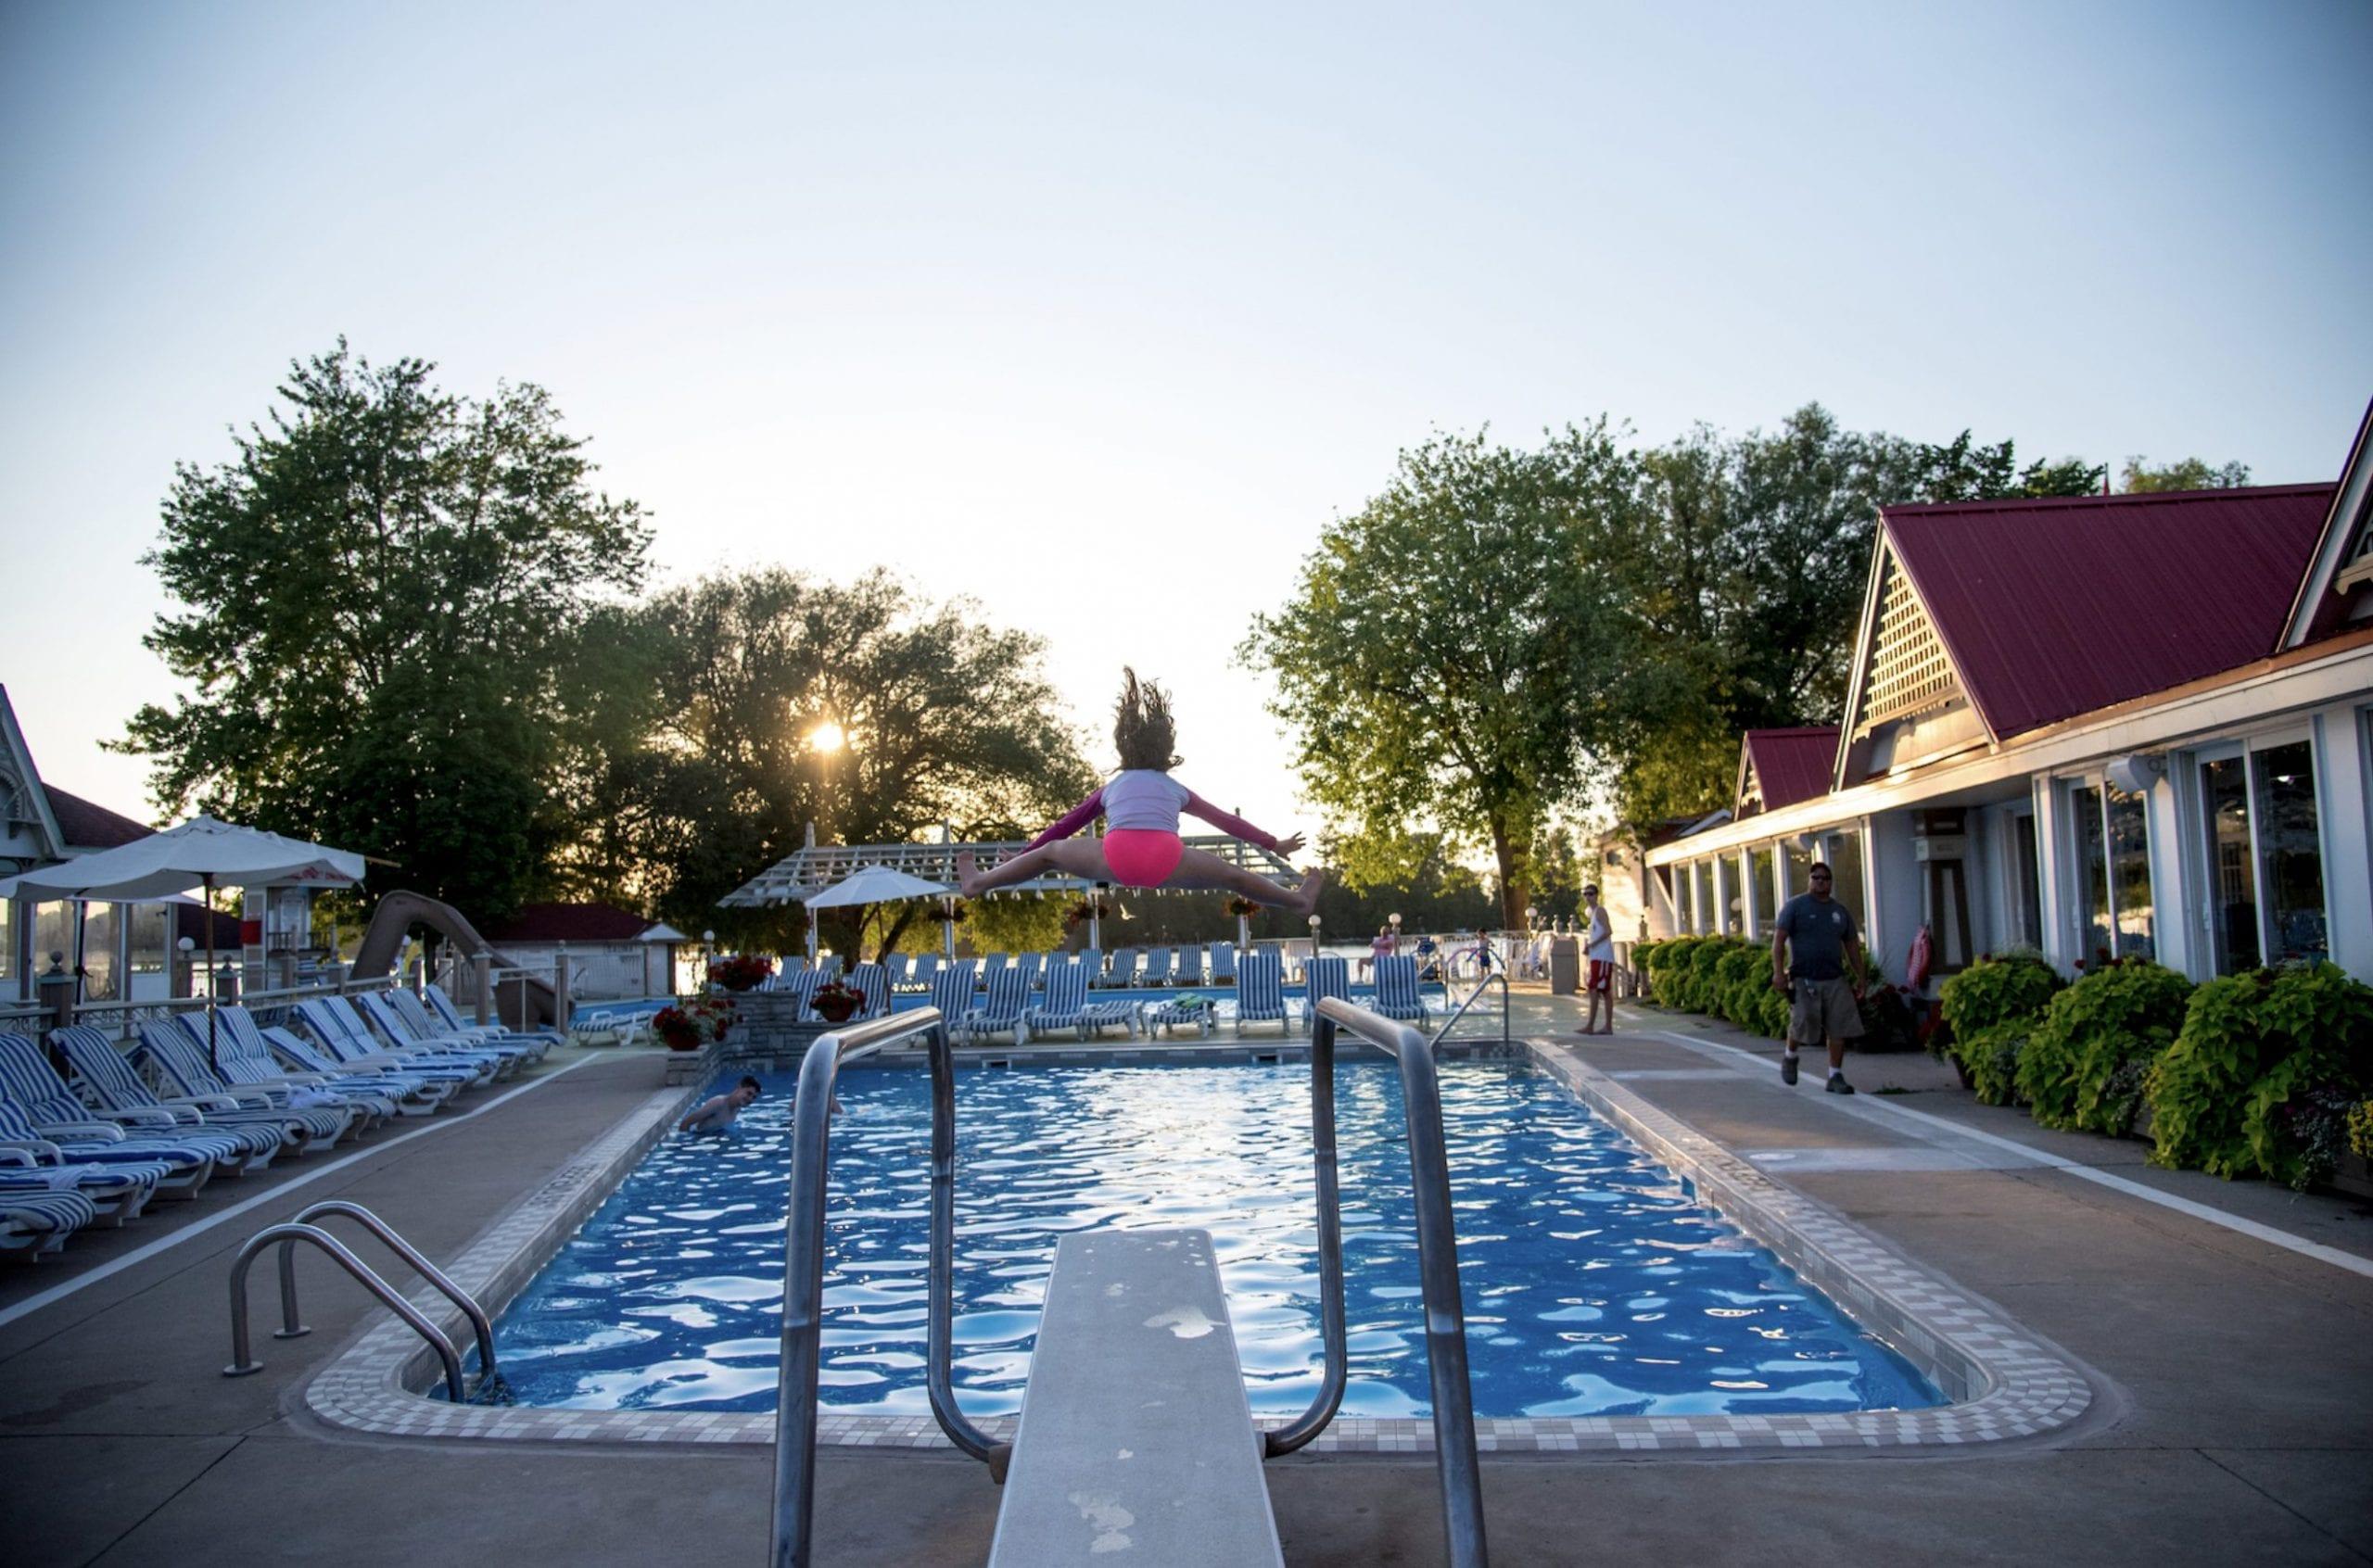 Fern Resort Pool Deck At Sunset